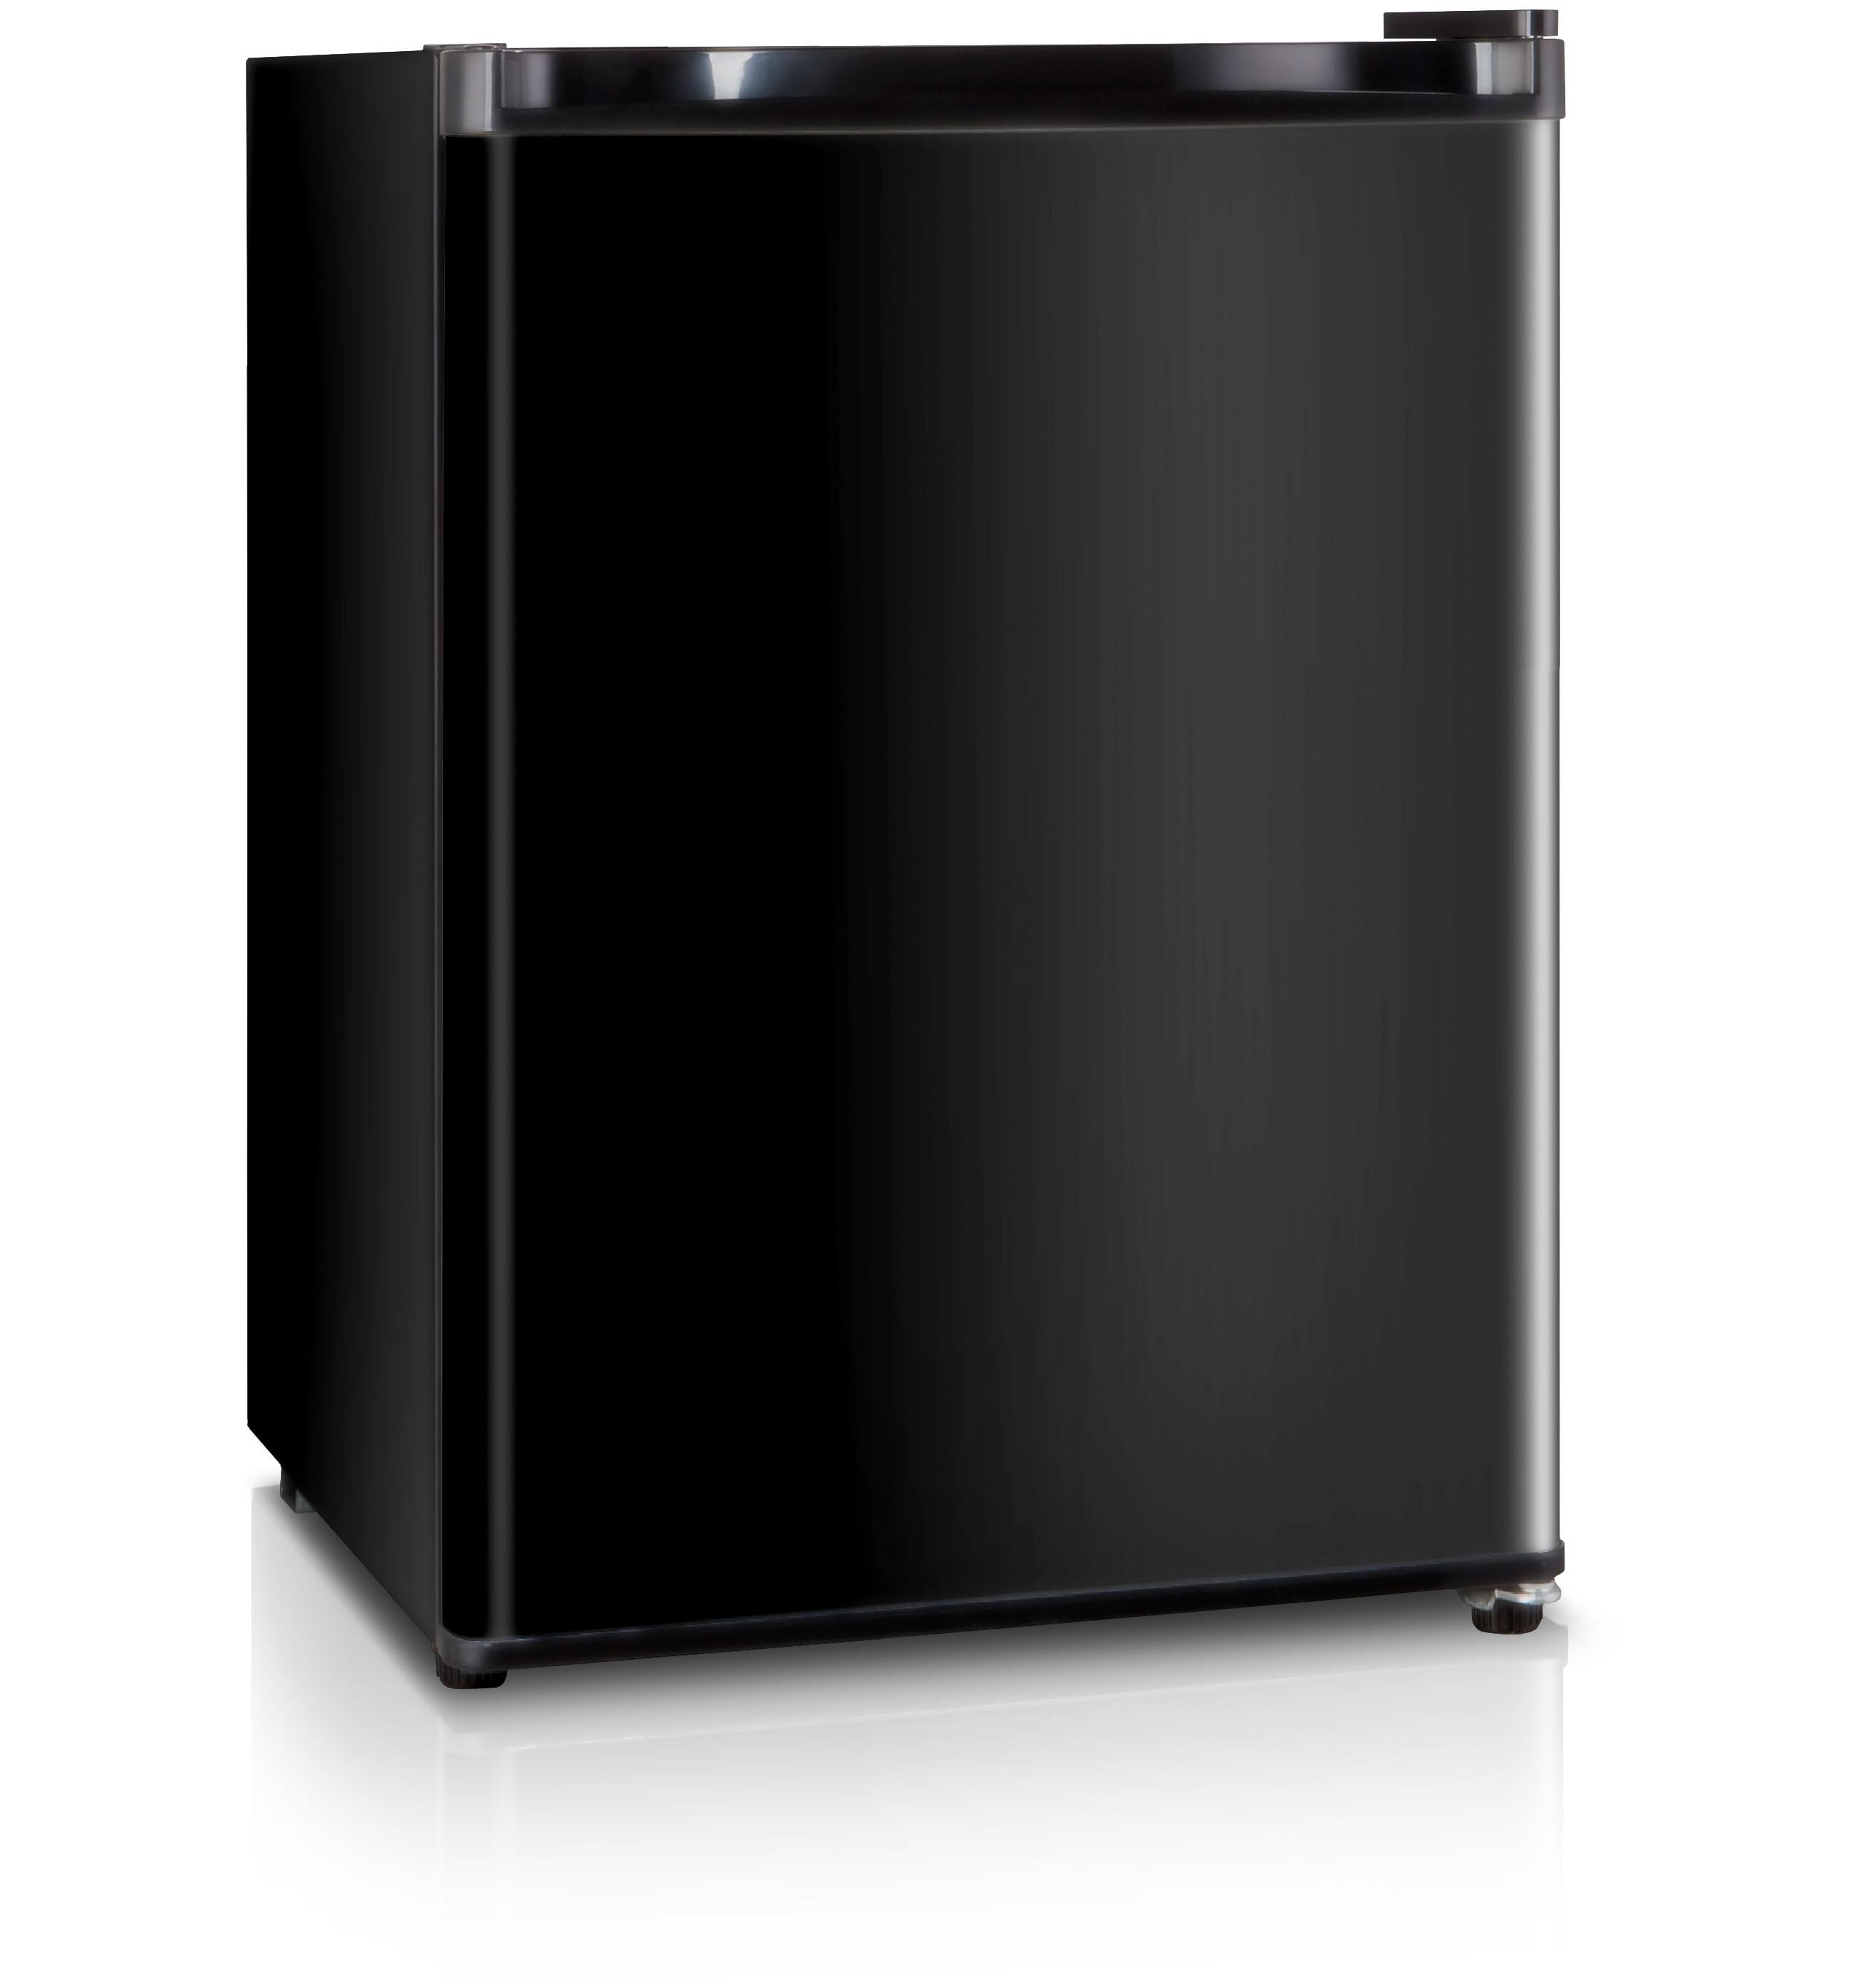 Hisense 2.7 Cf Compact Refrigerator